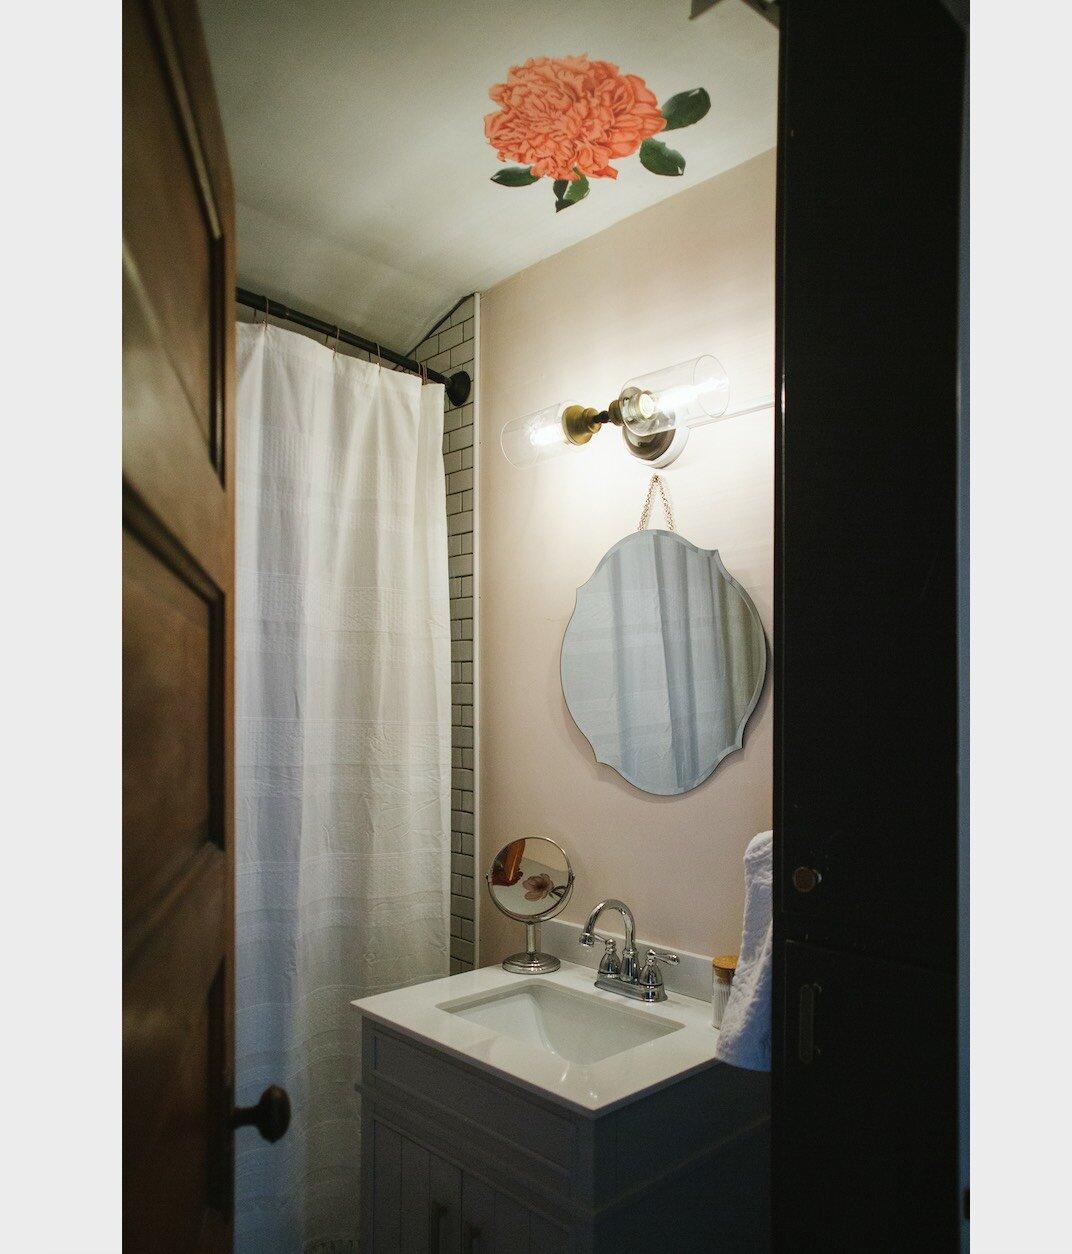 Small Bathroom after renovation